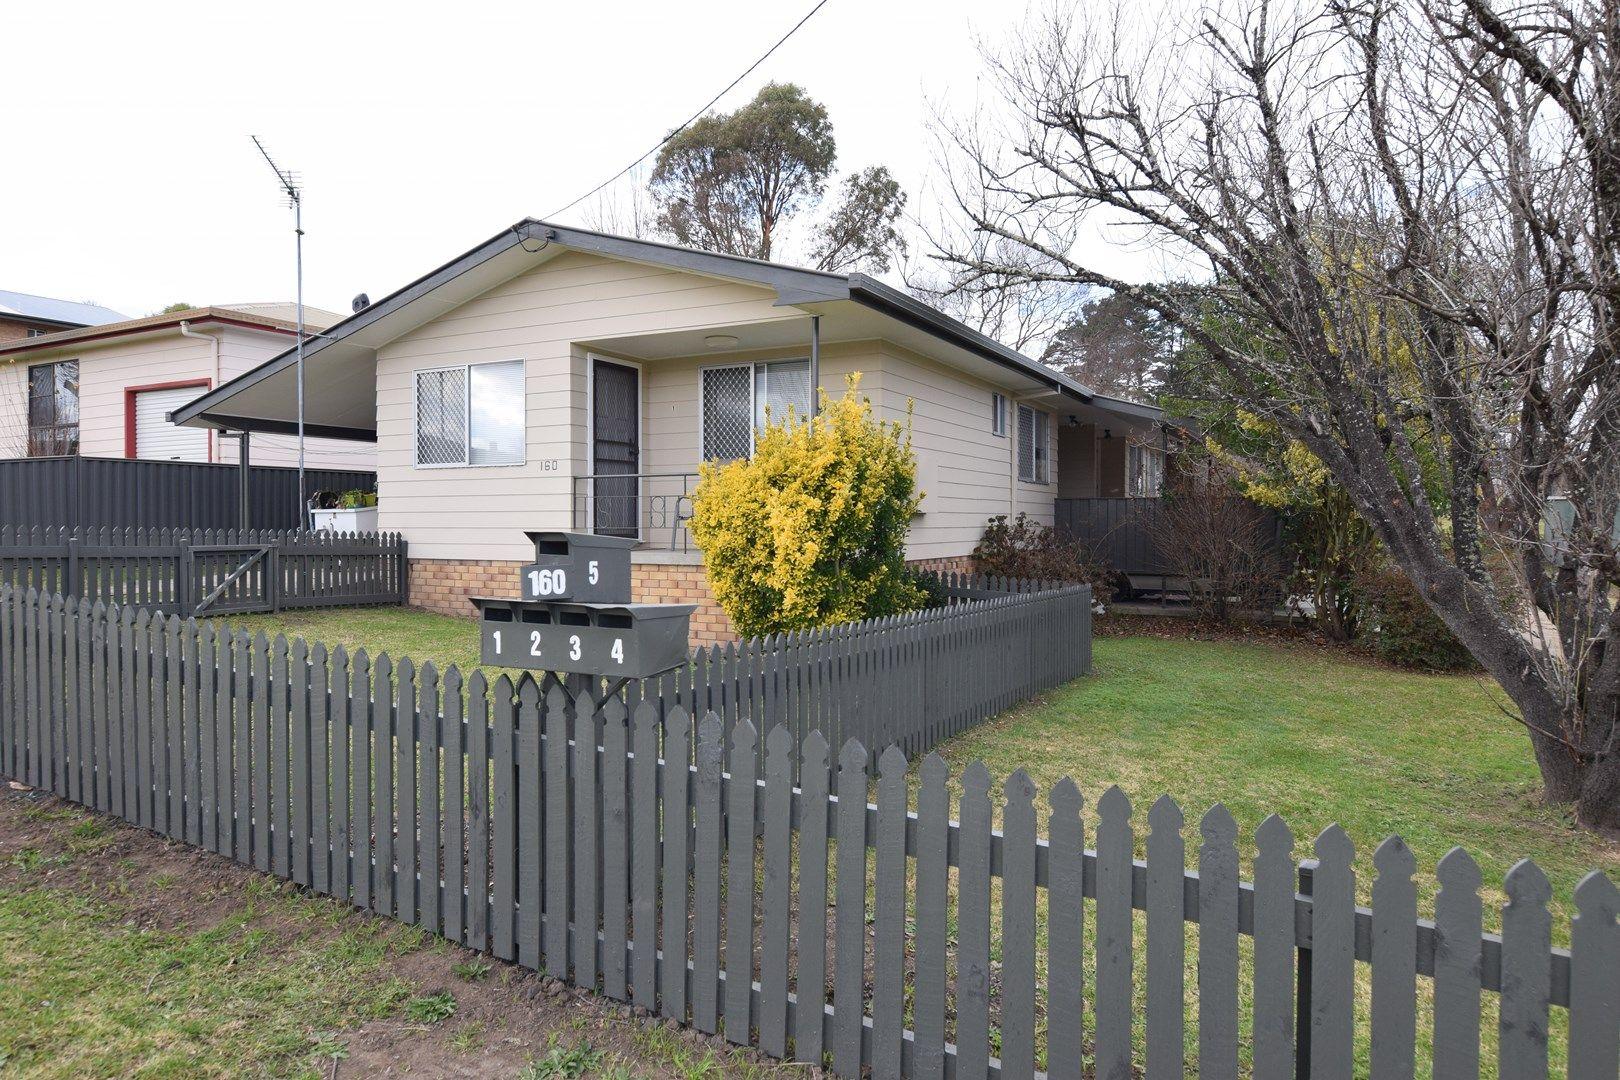 4/160 Bulwer St, Tenterfield NSW 2372, Image 0